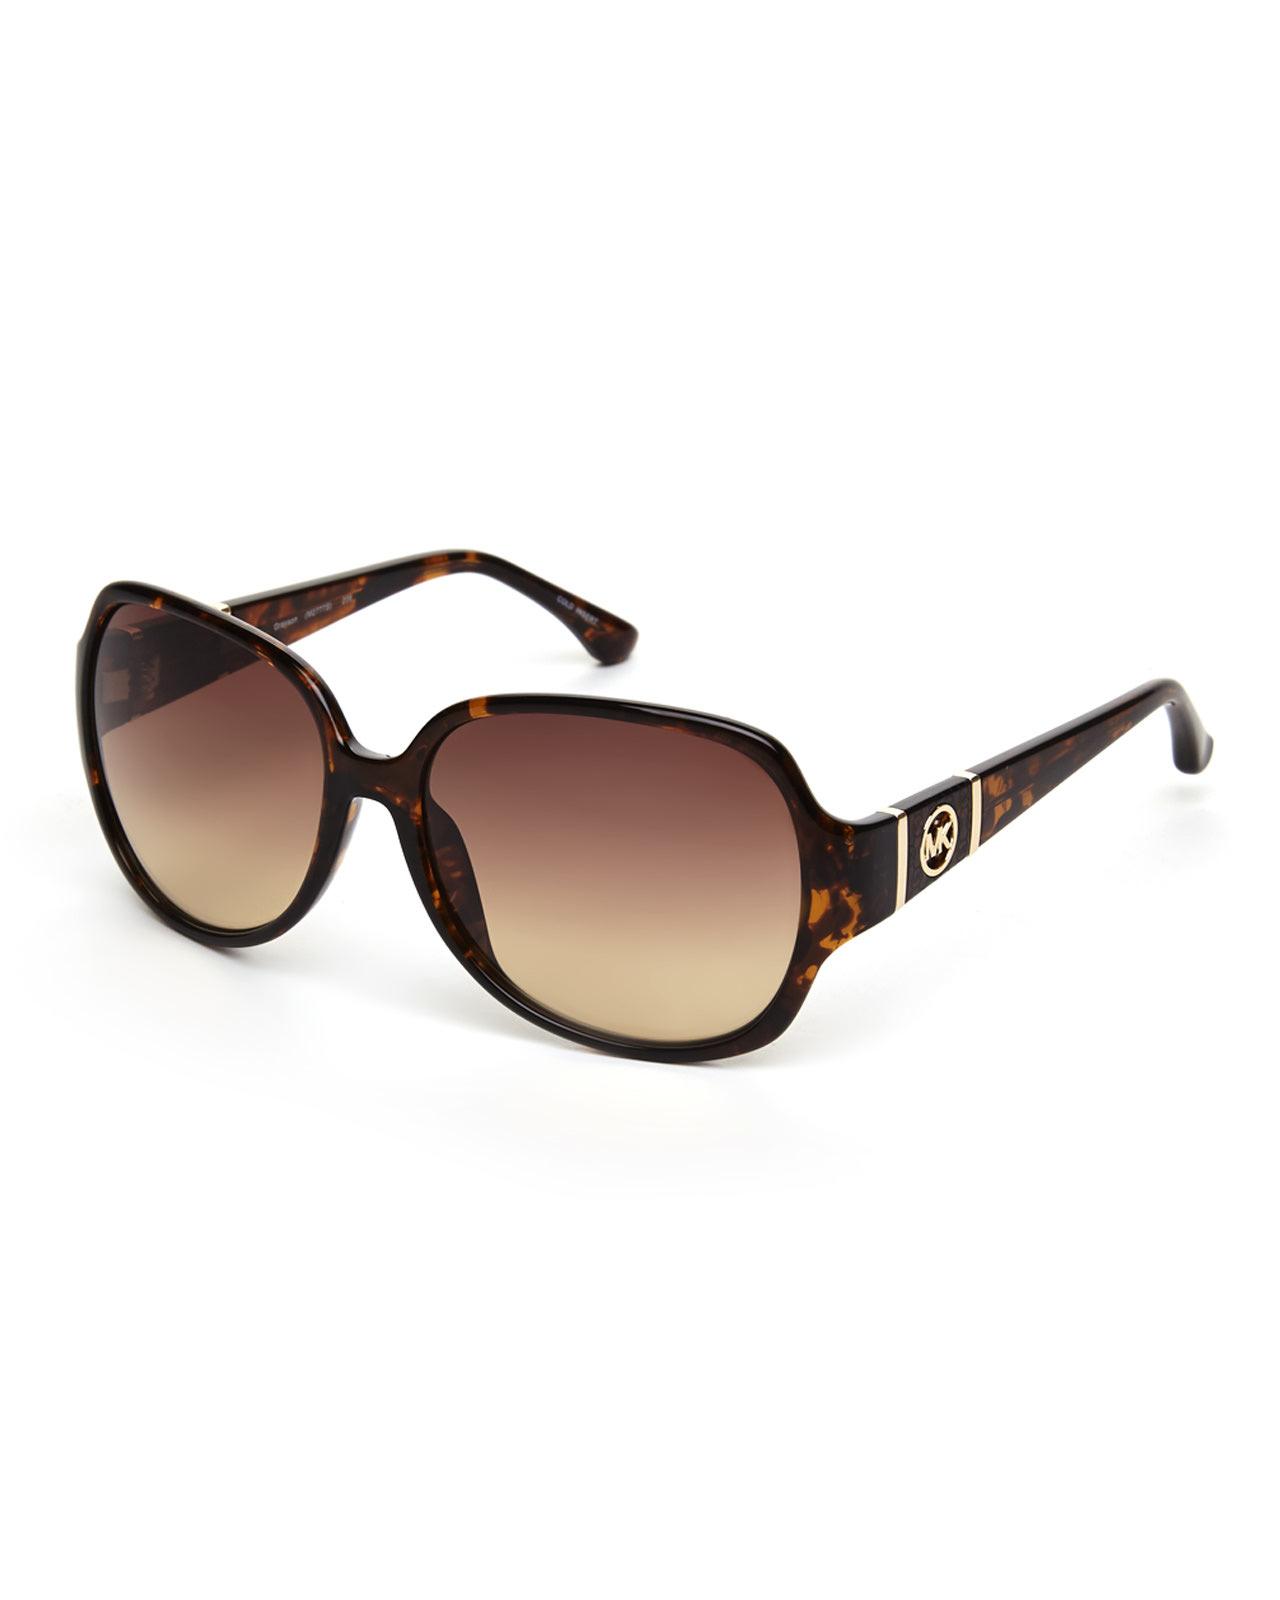 Michael Kors Grayson Sunglasses  michael michael kors tortoises look m2777s grayson xl round